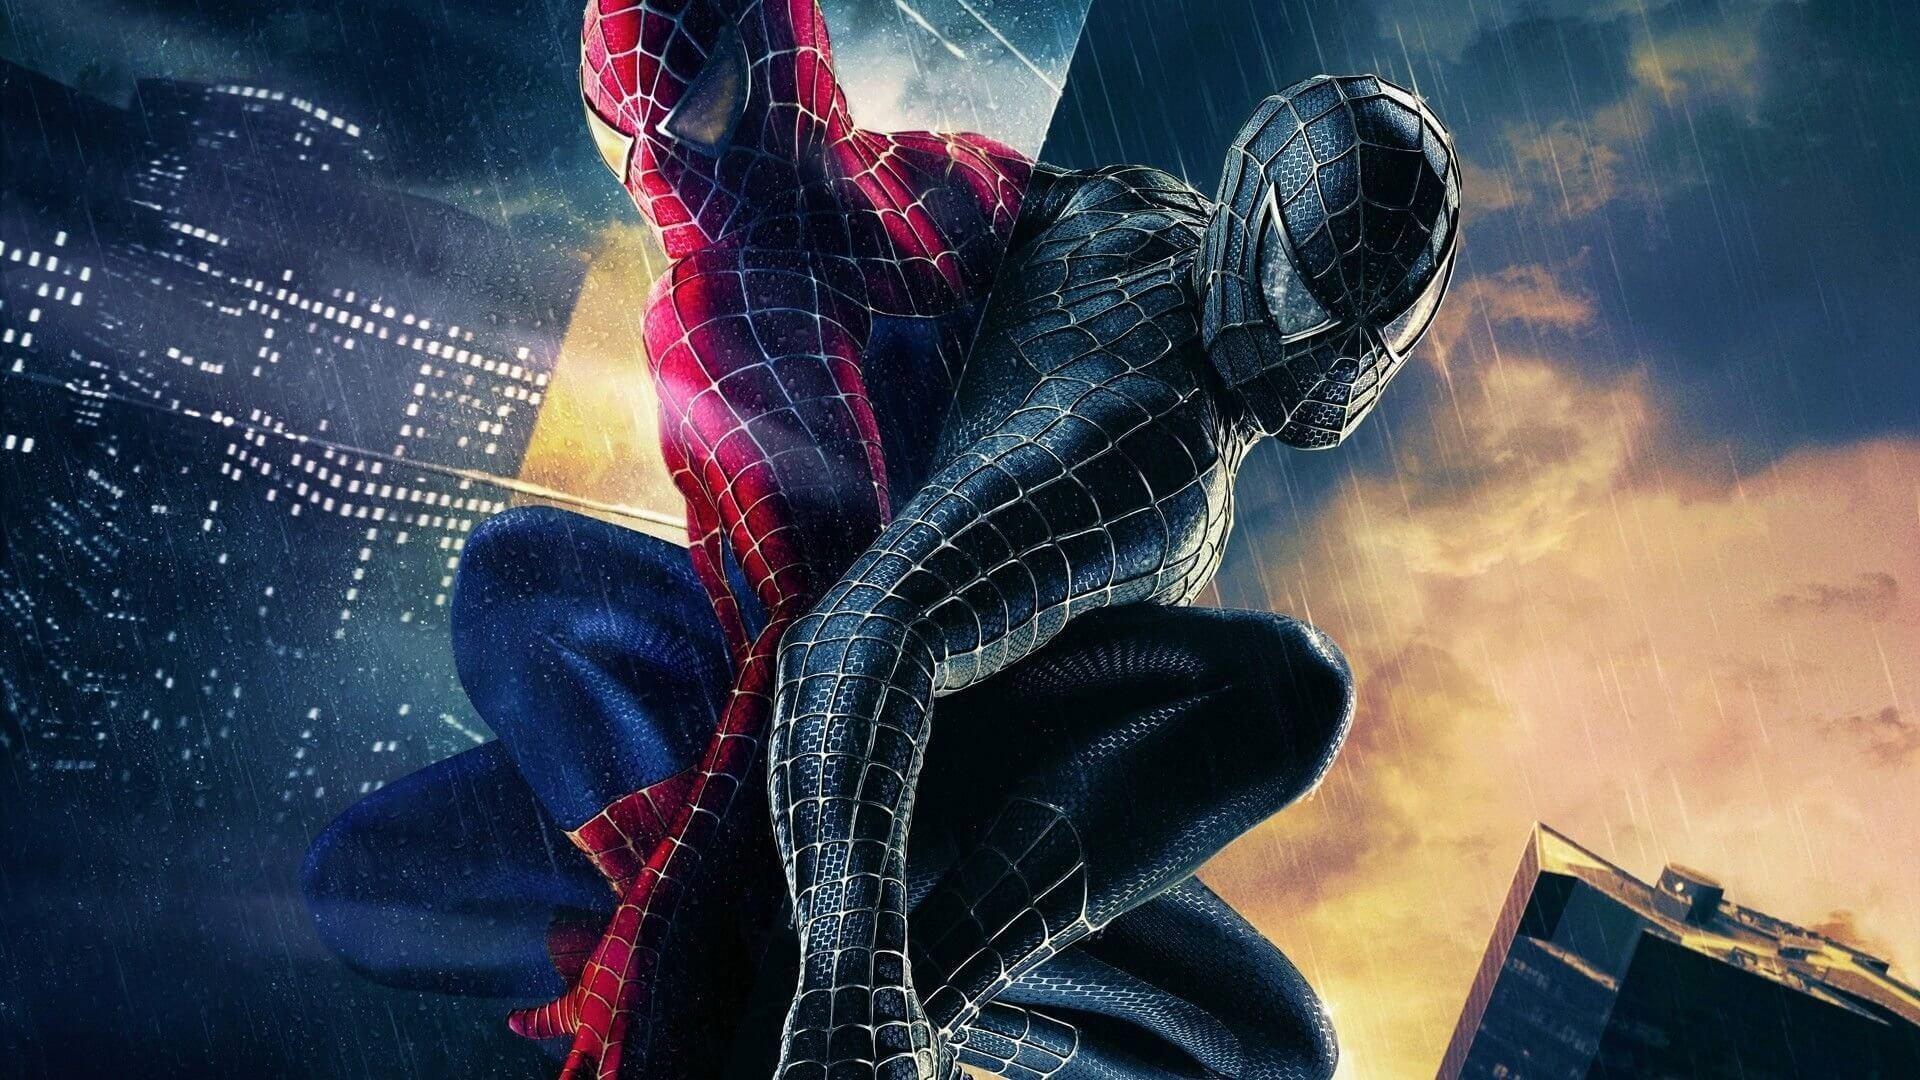 Spider-Man 3 Box Office Ranking